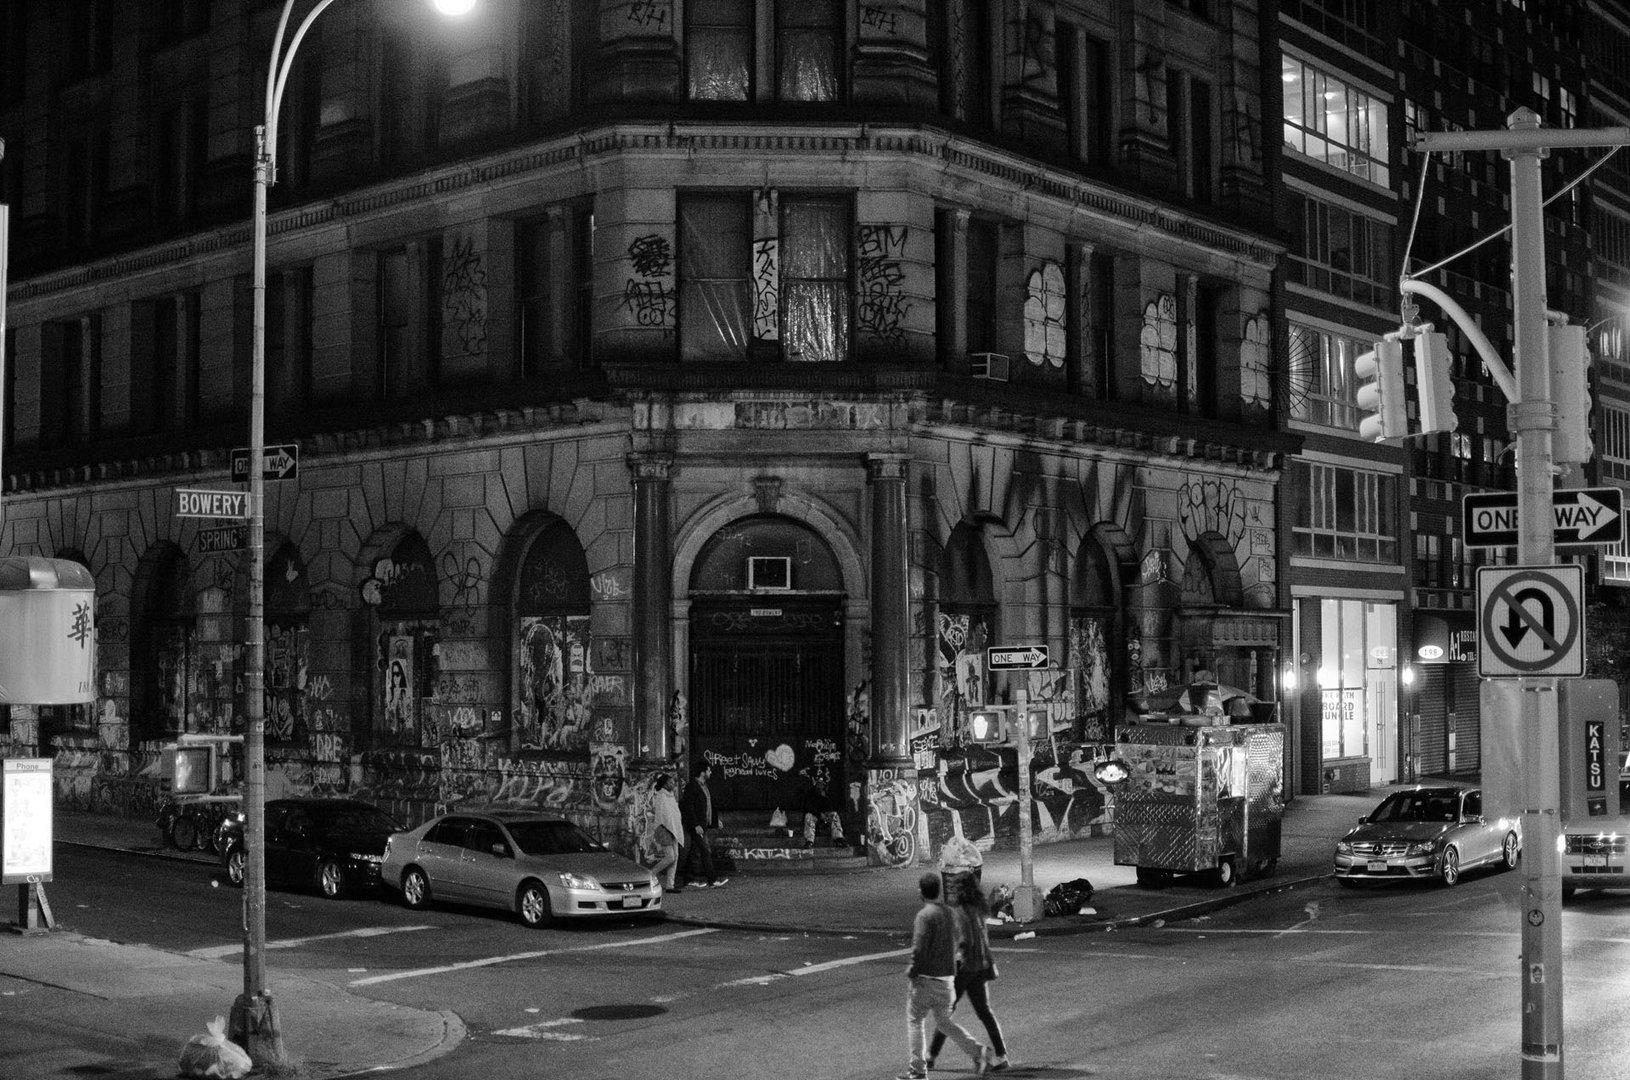 Bowery / Spring St